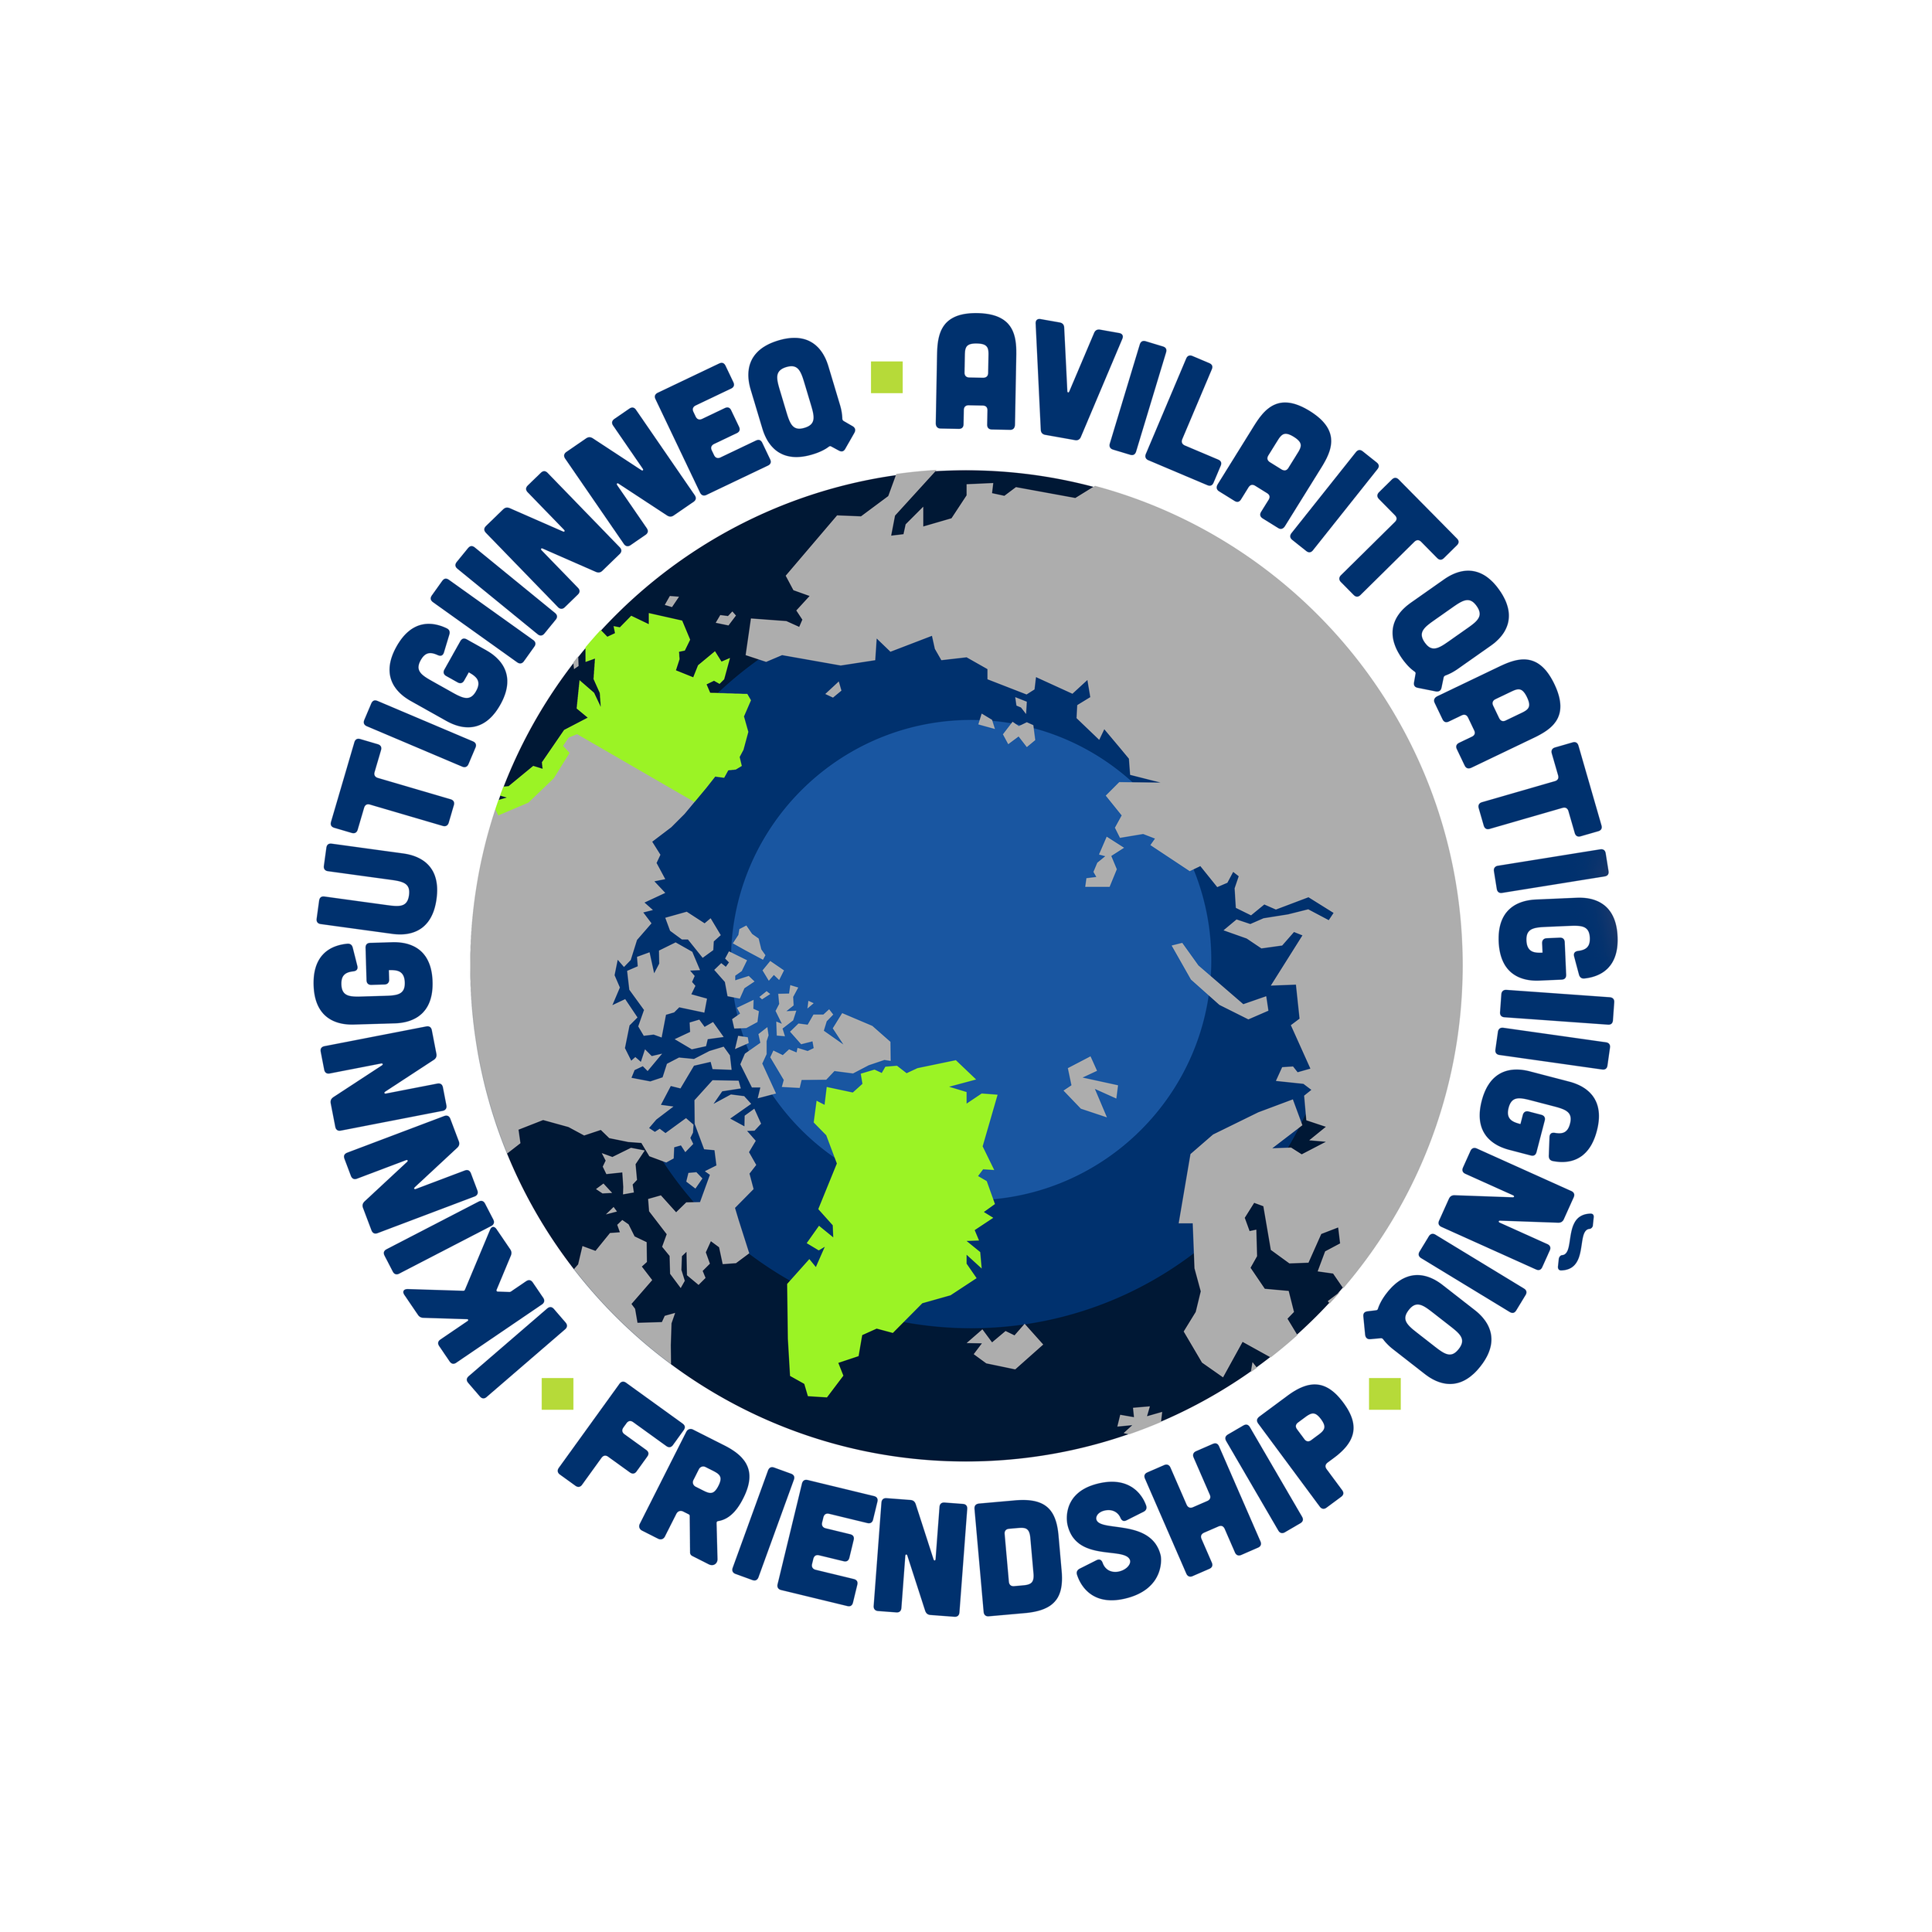 Greenland-Alaska Logo Final.png